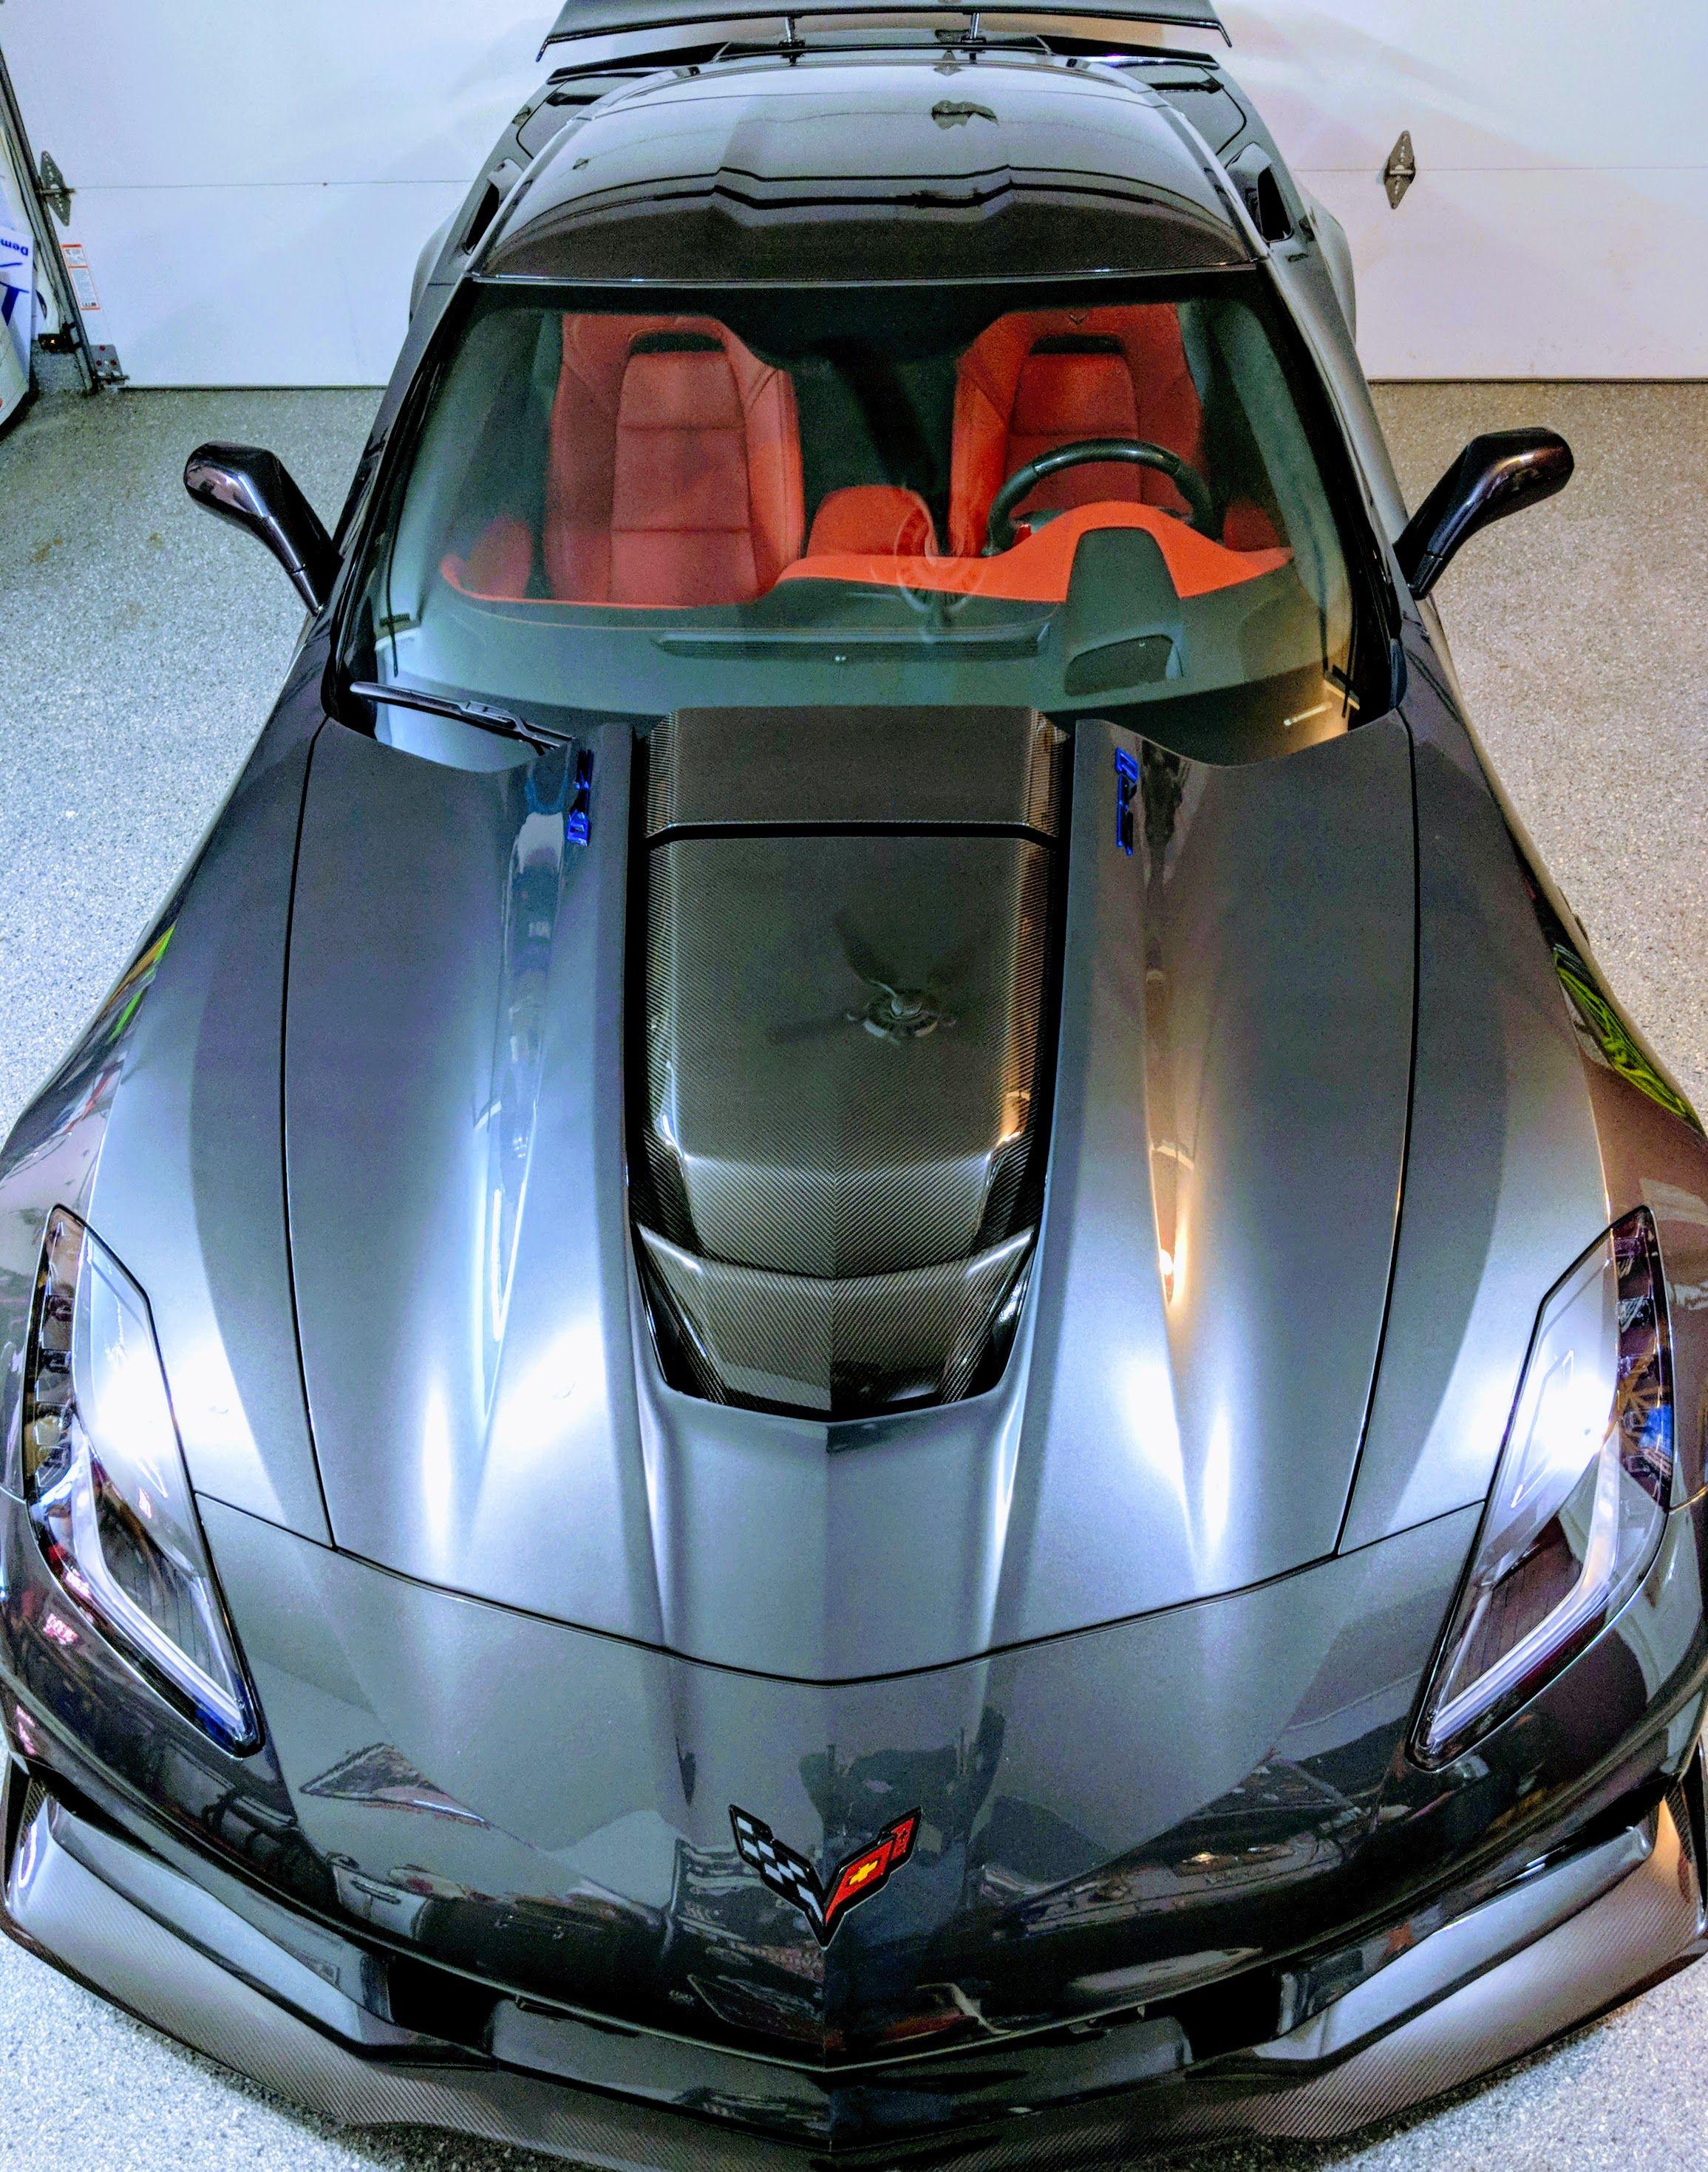 2019 Zr1 Used Corvette Corvette Zr1 Corvette Stingray